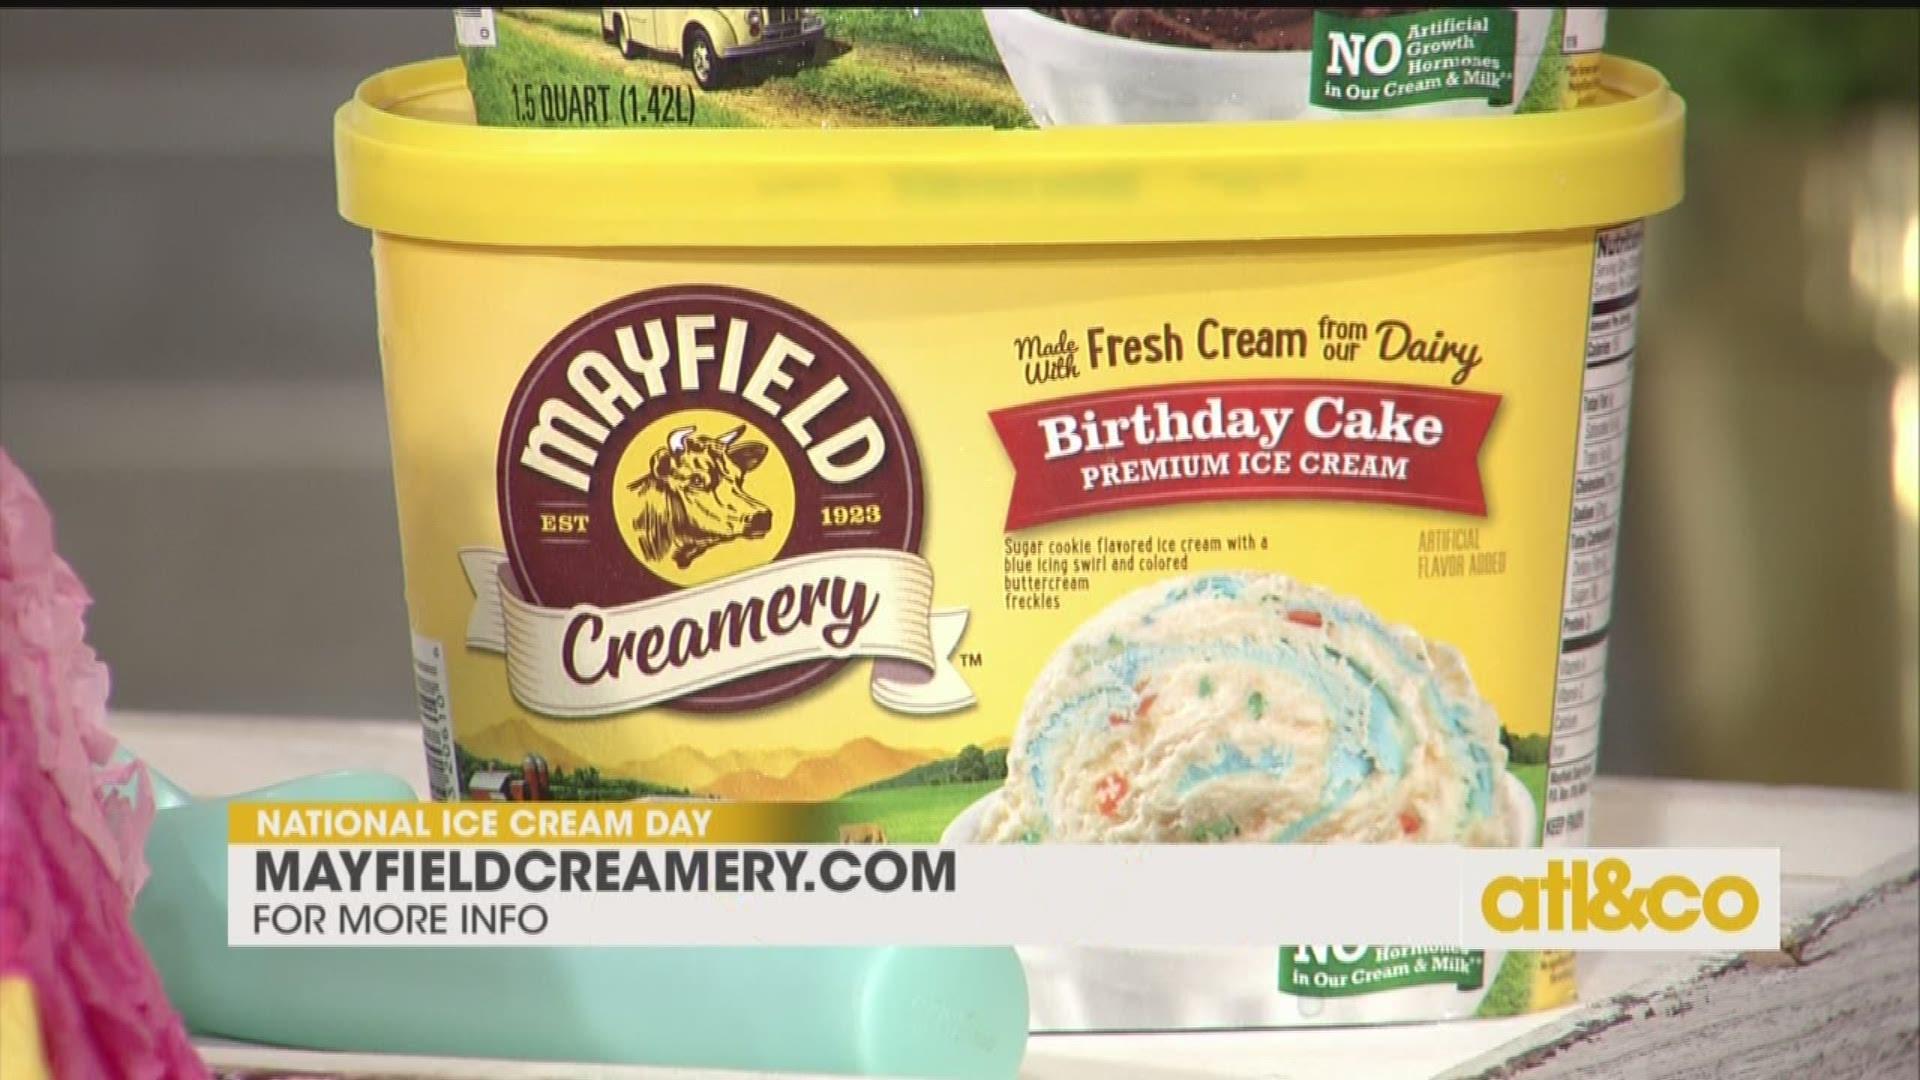 Astounding Celebrate National Ice Cream Day With Mayfield Creamery 11Alive Com Funny Birthday Cards Online Alyptdamsfinfo